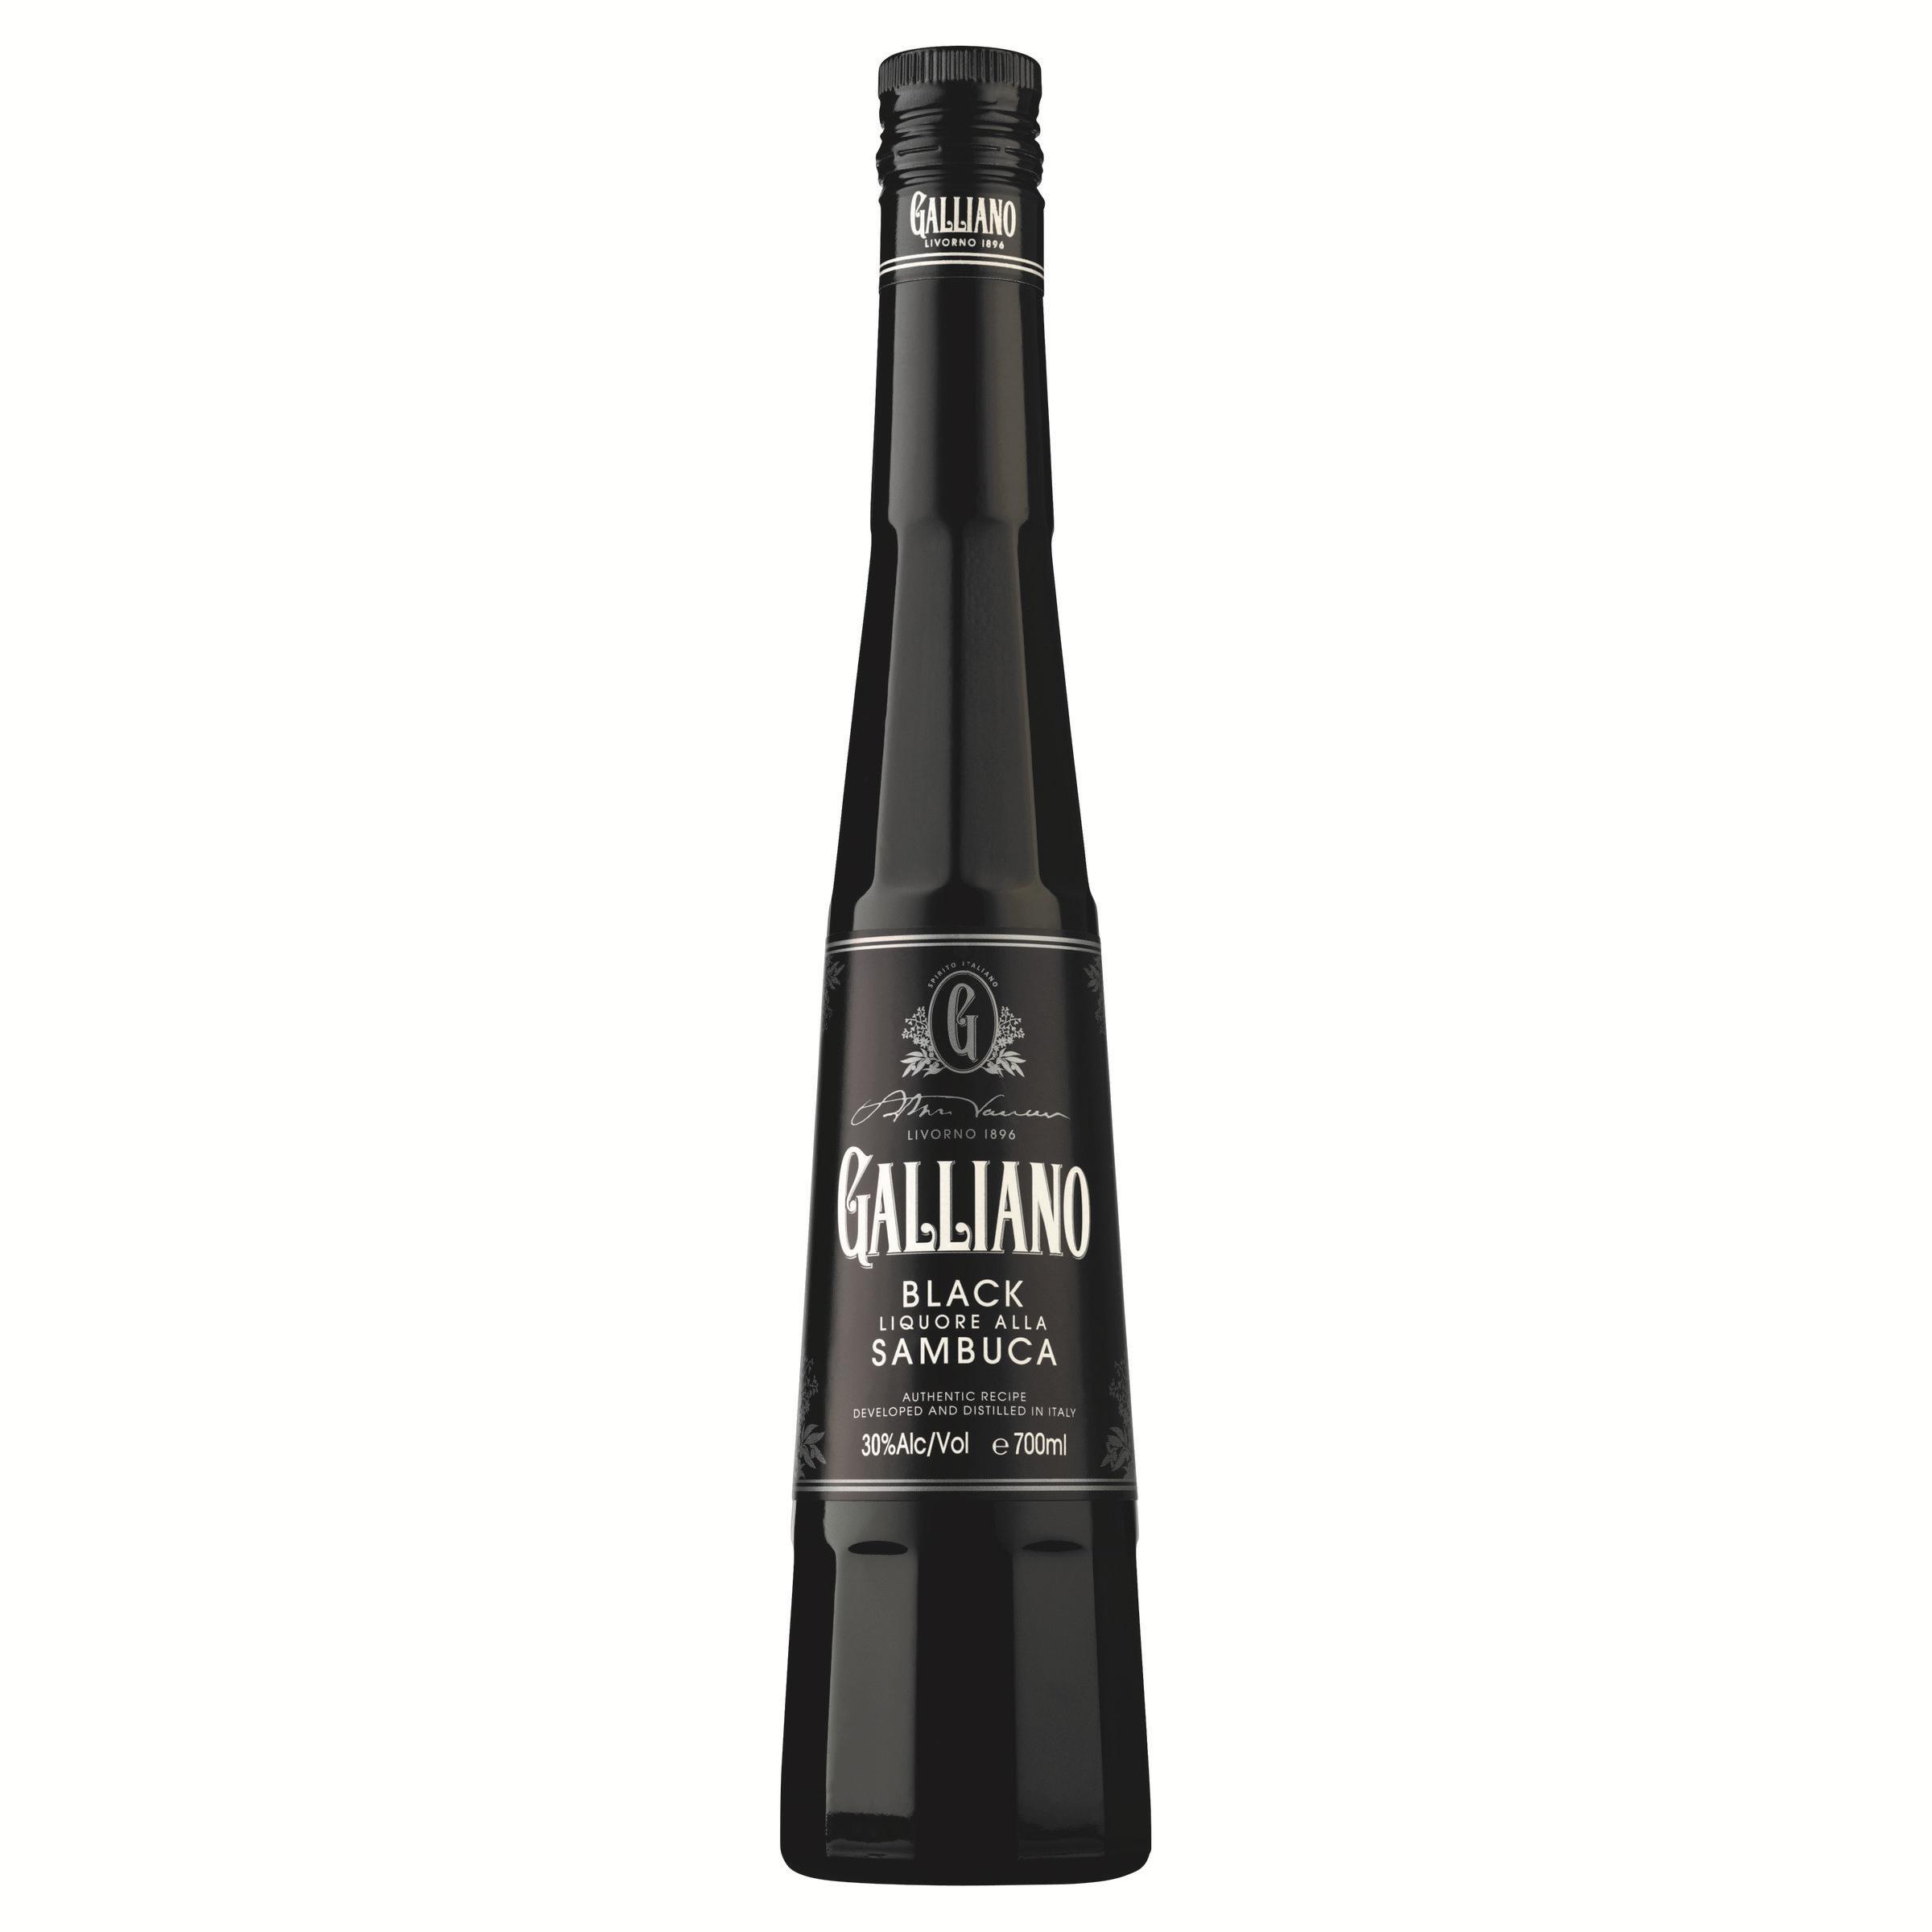 GALLIANO BLACK SAMBUCA 30%